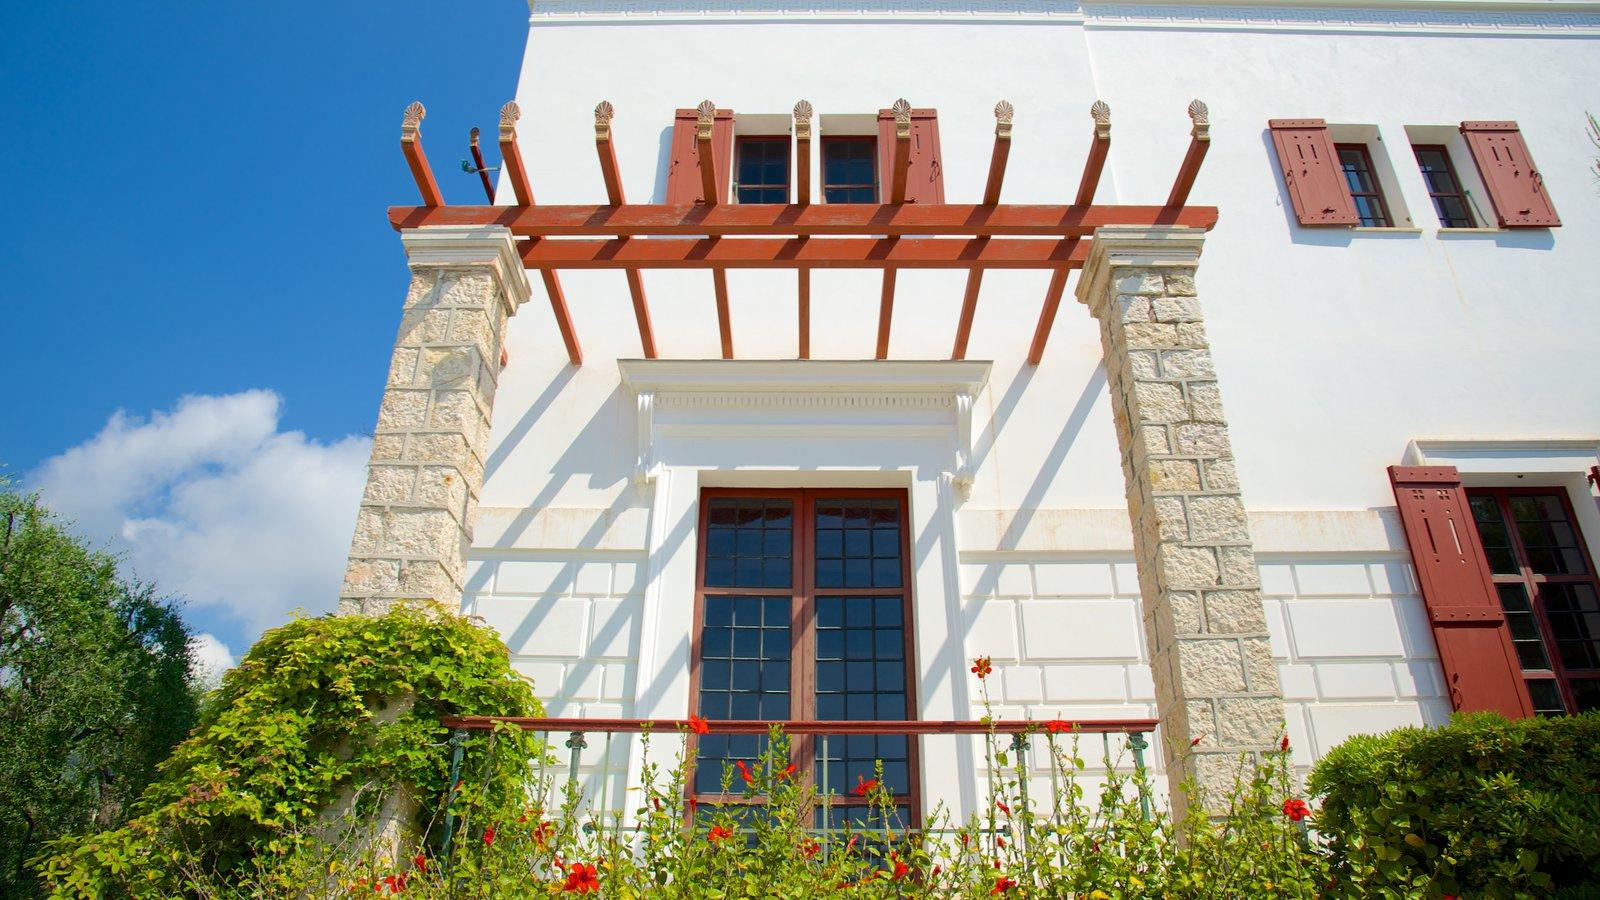 Villa Kerylos caracterizando elementos de patrimônio e um jardim